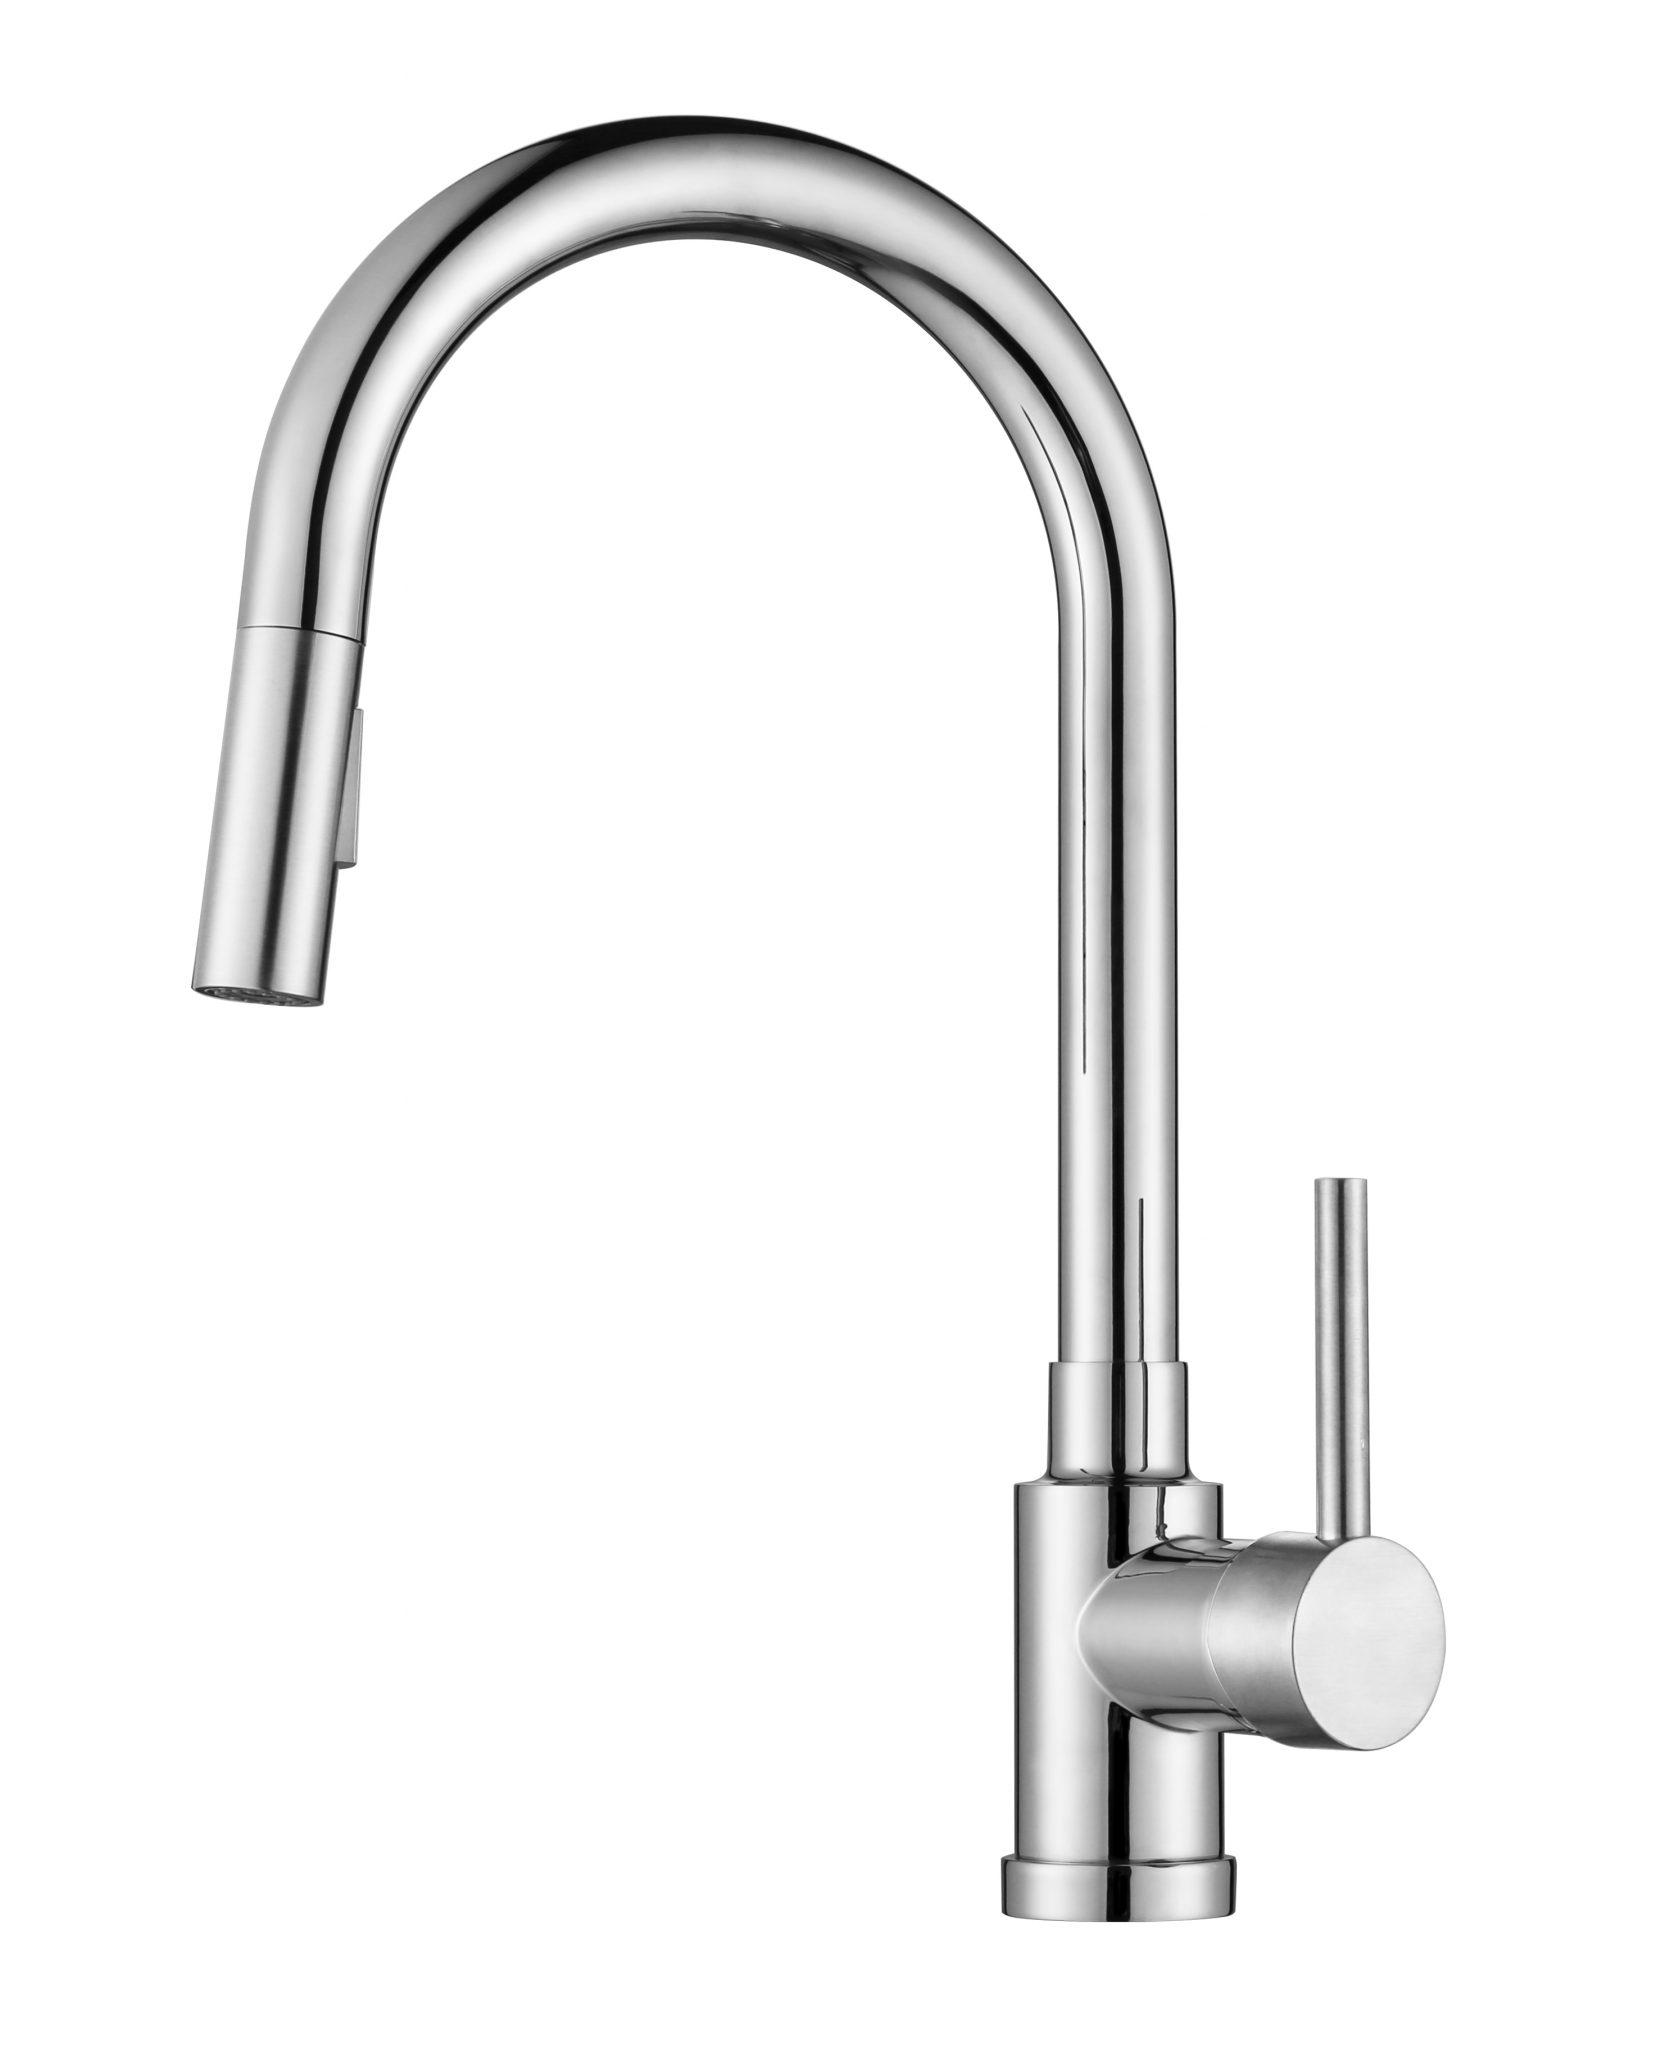 Pull Down Kitchen Faucet Ksk1120c Oakland